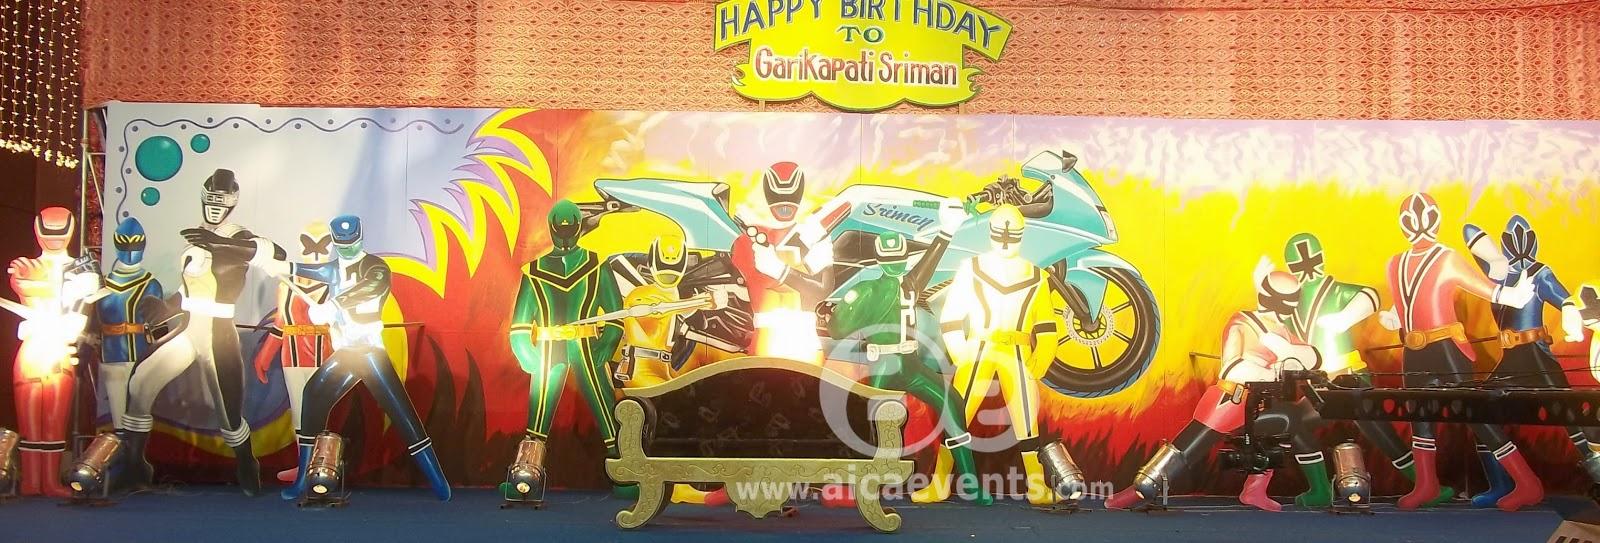 Magnificent Power Ranger Wall Decor Image - Art & Wall Decor ...